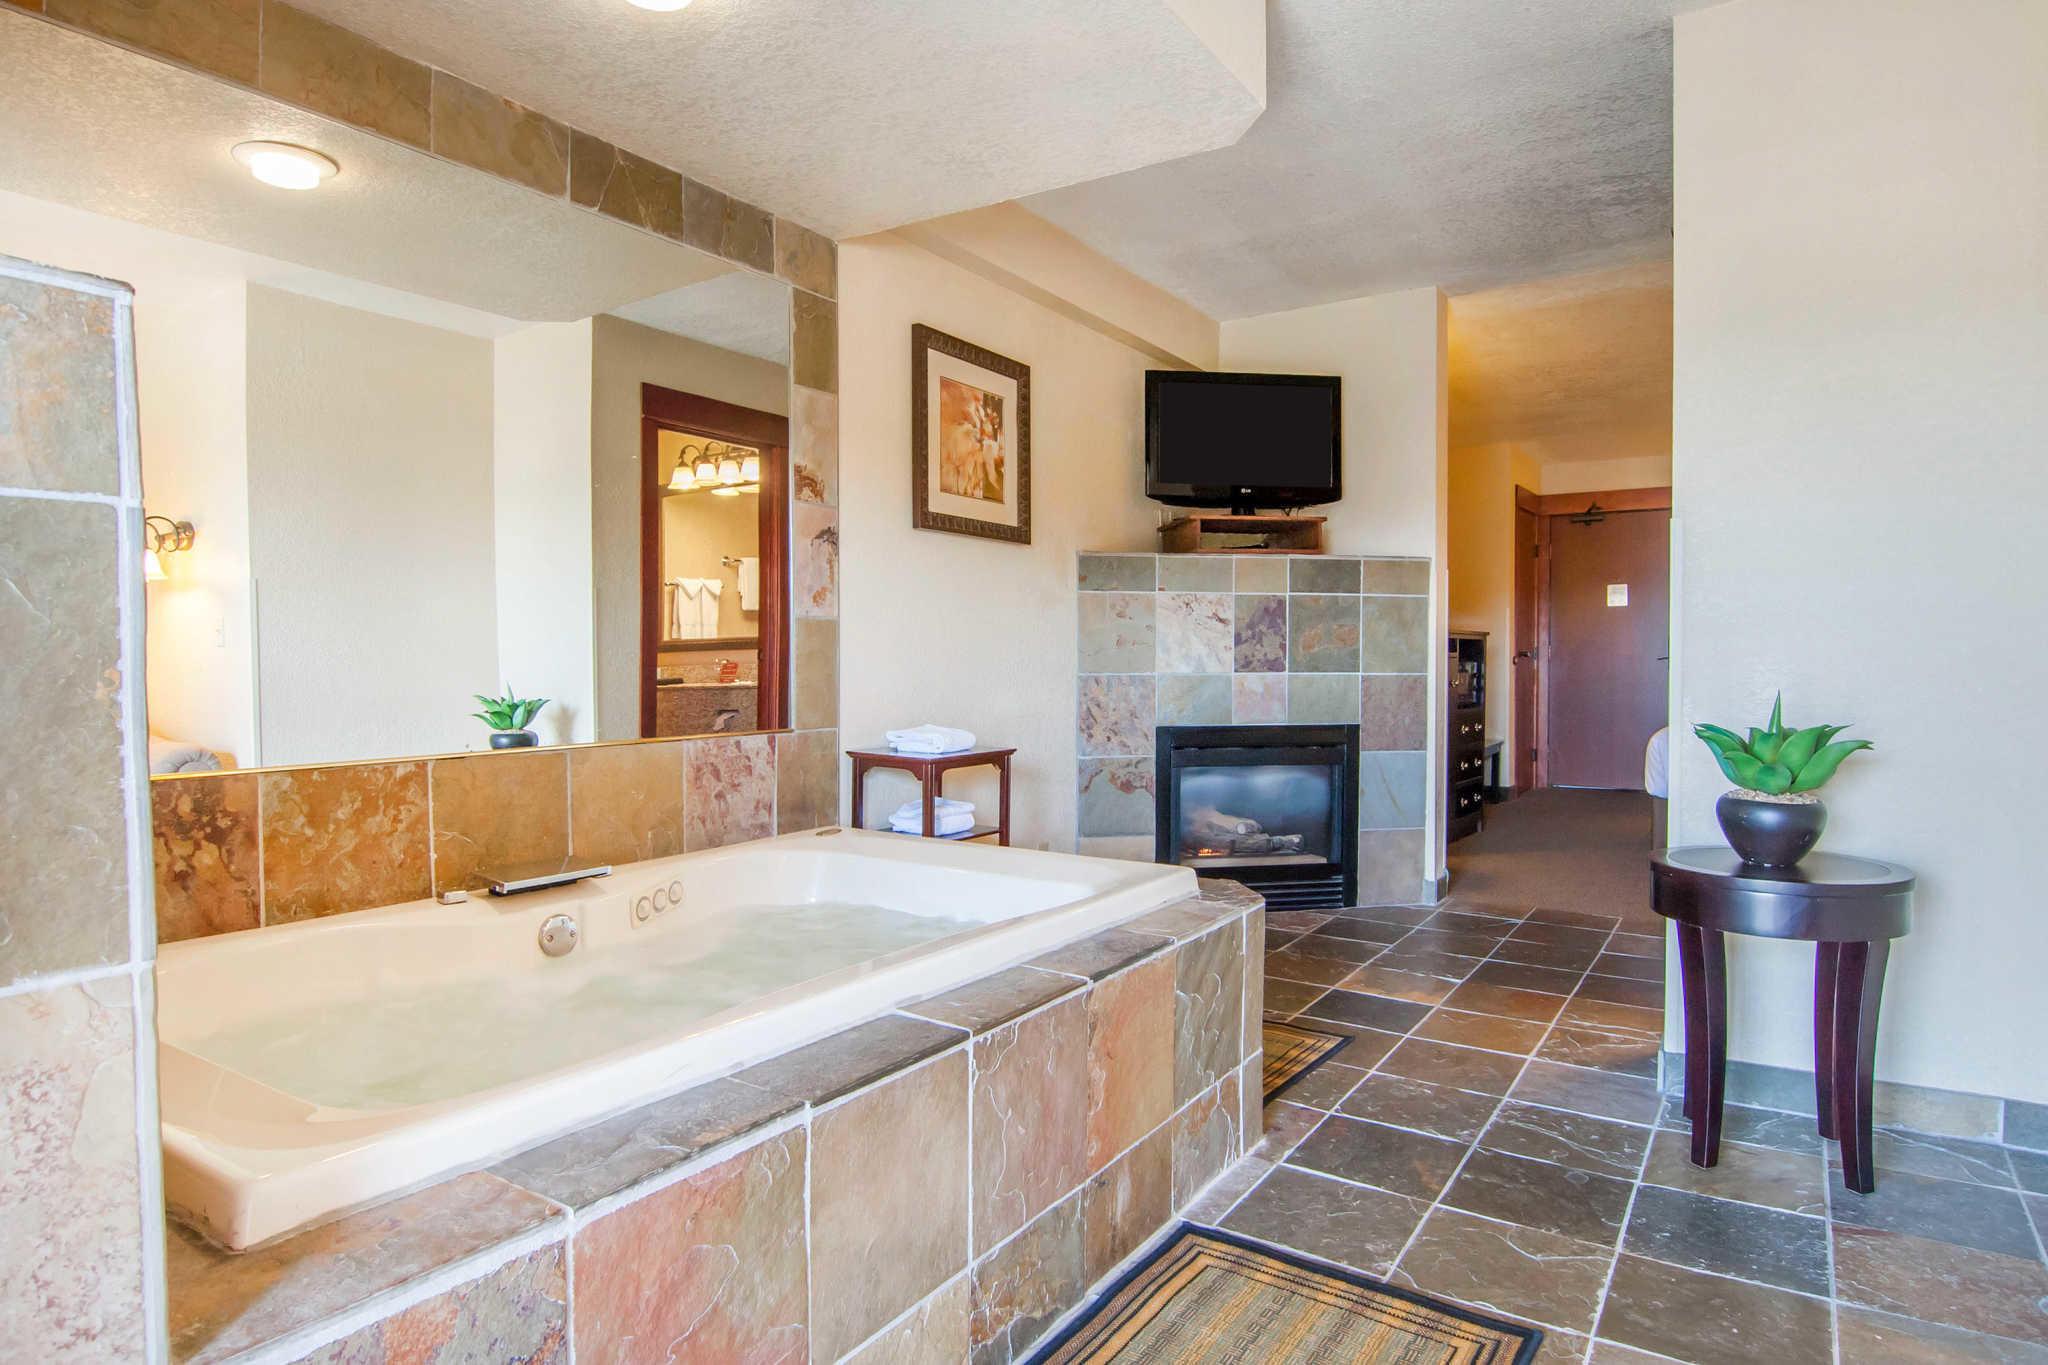 Comfort Inn & Suites image 28